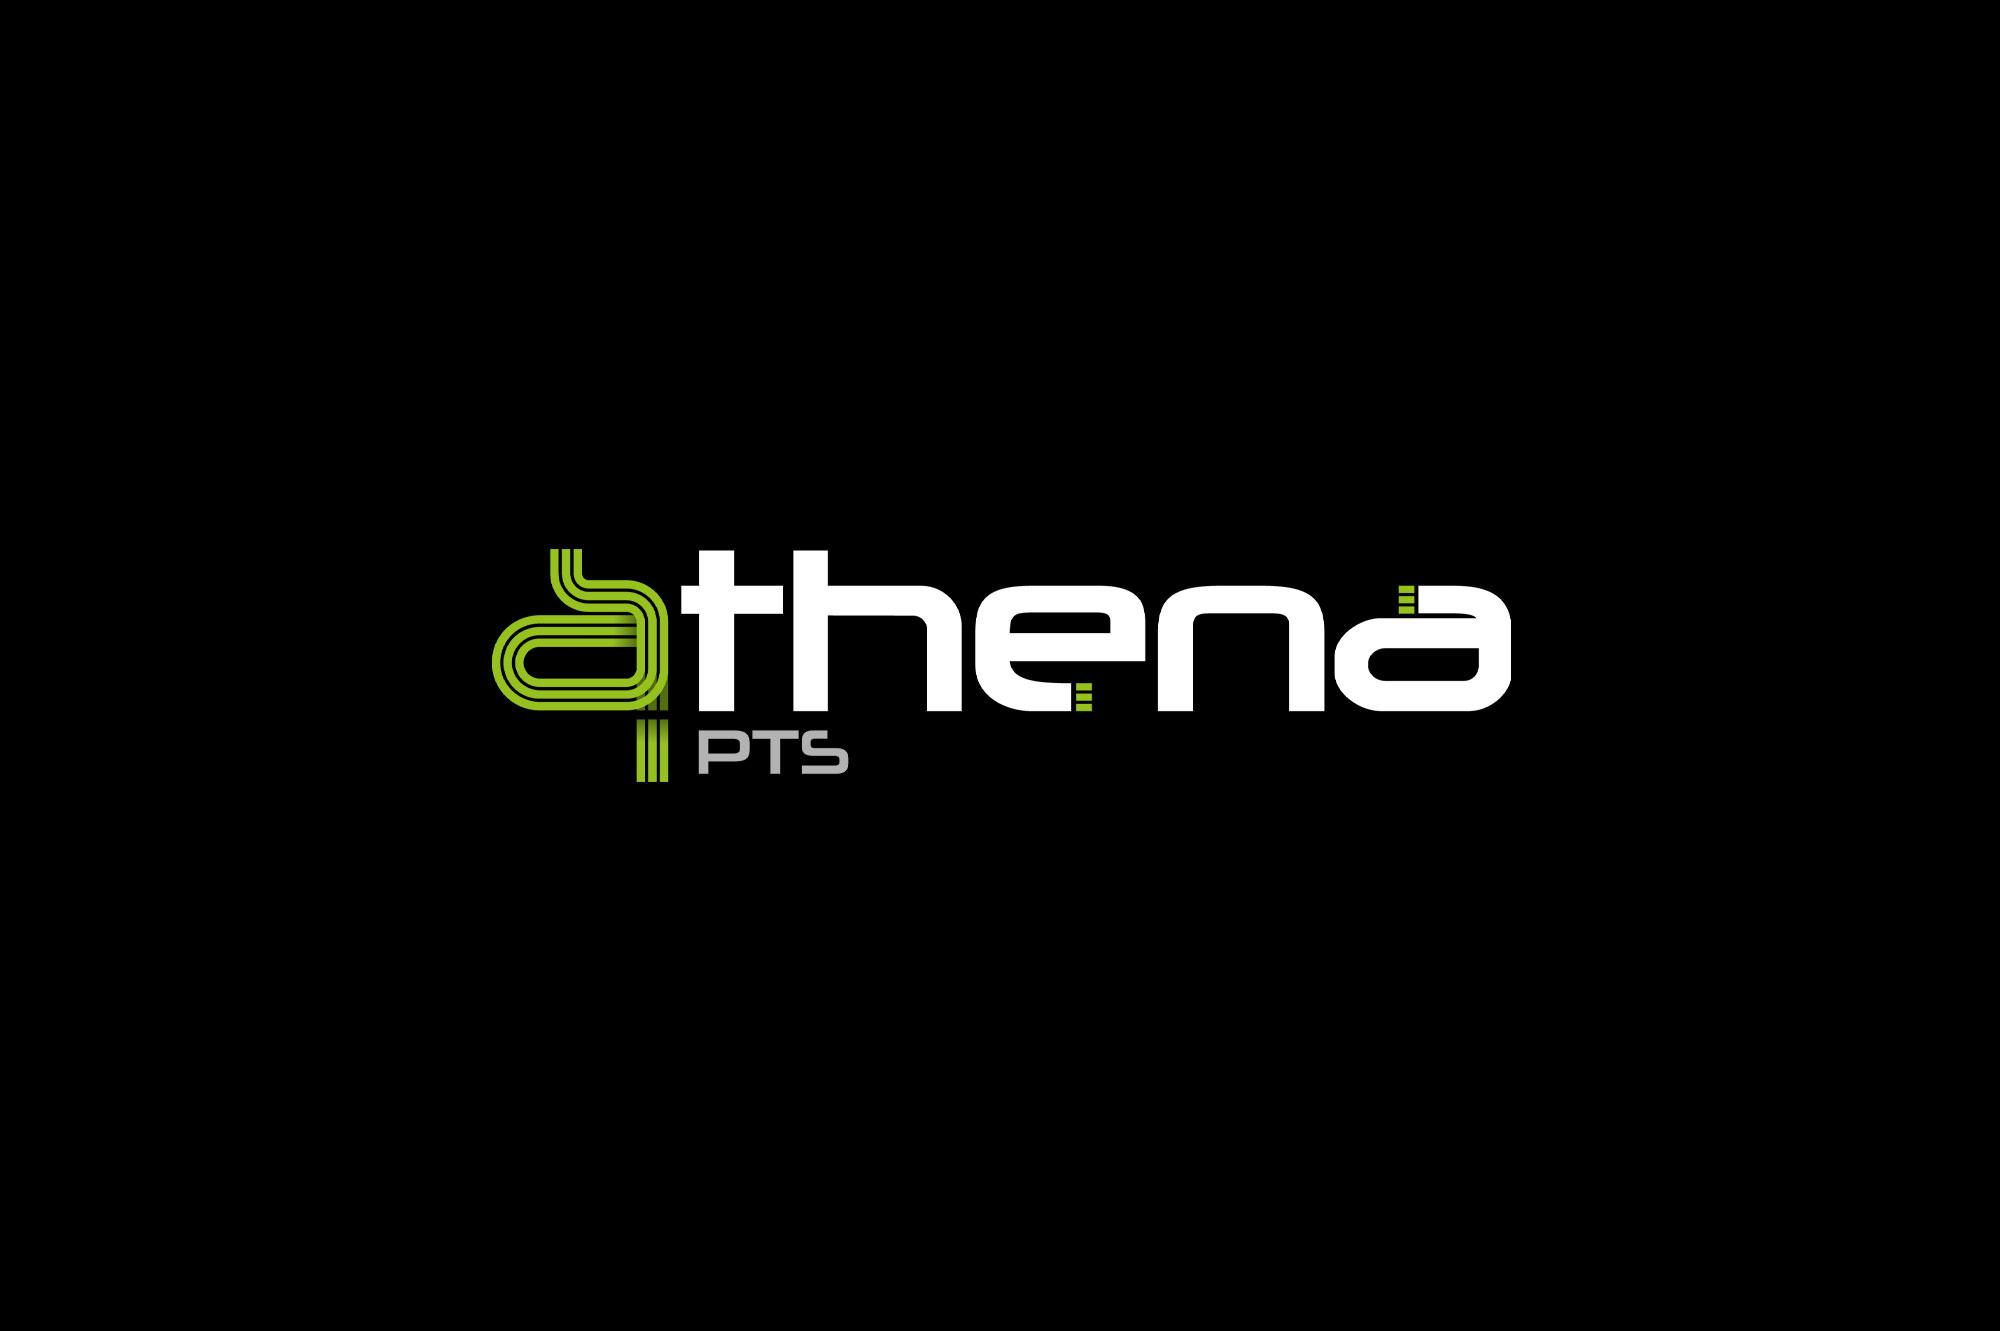 athena pts logo